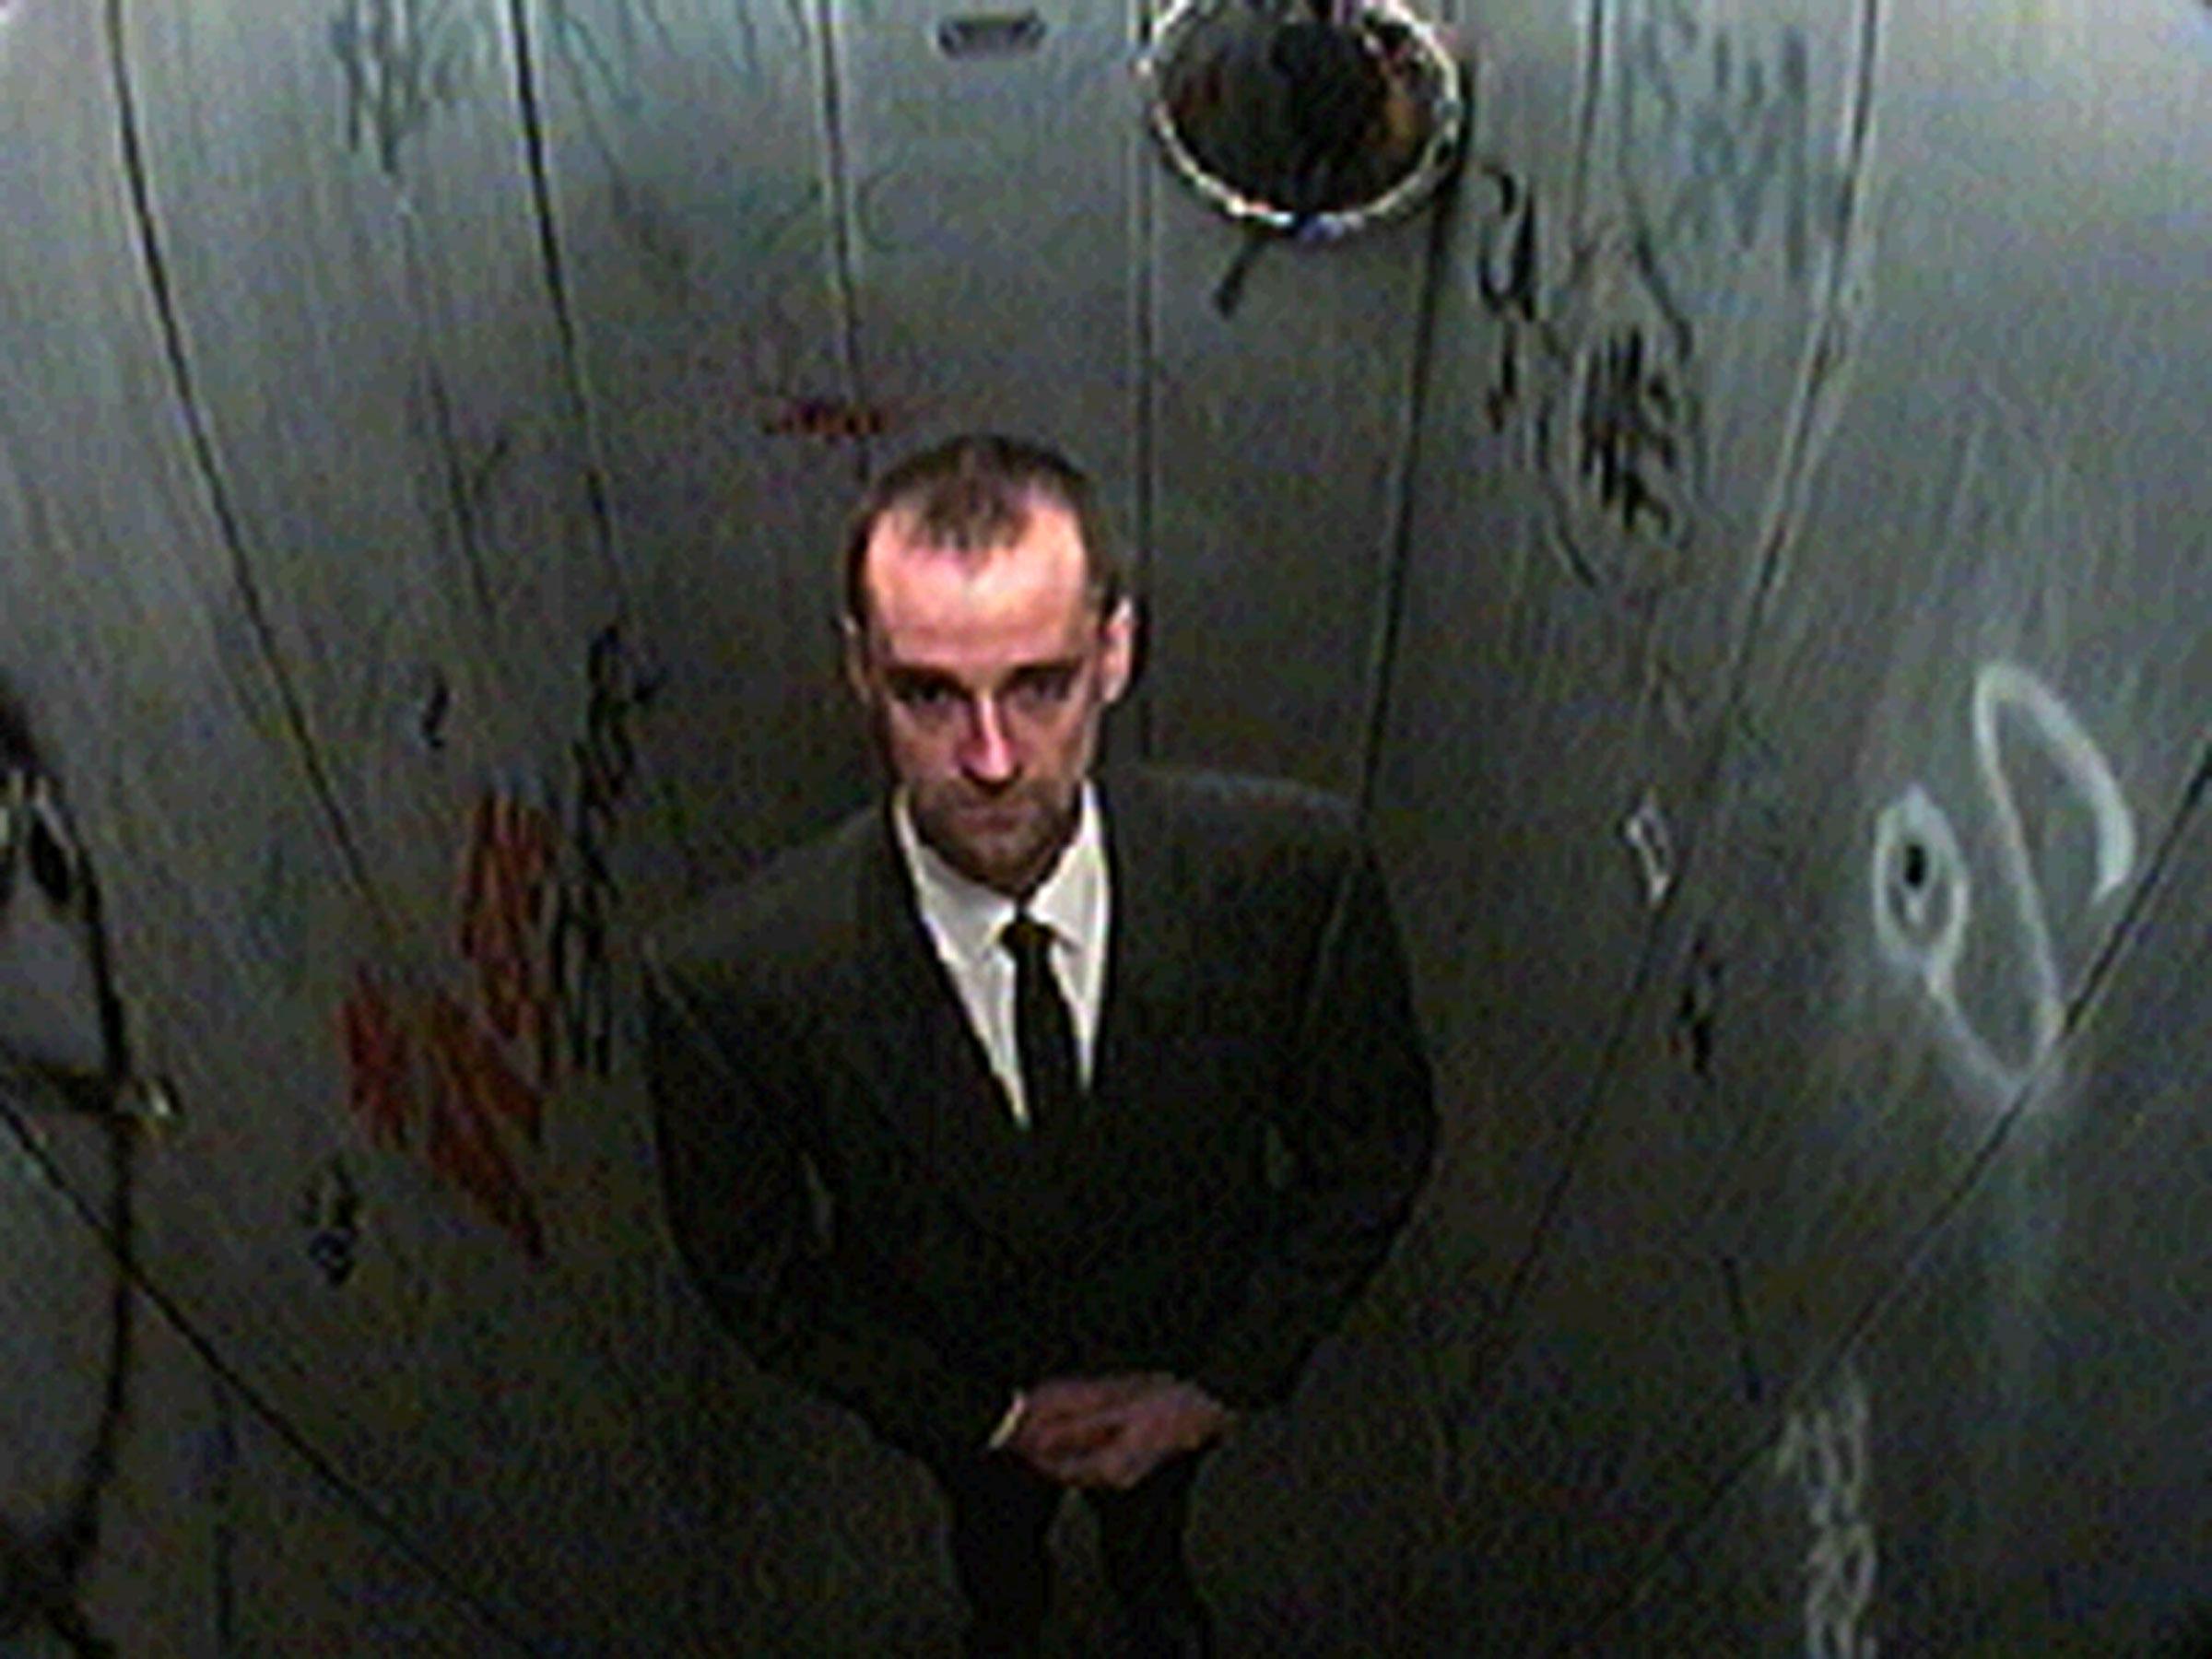 1997-06-12-SF-Broth-Surveillance-tv04-danny